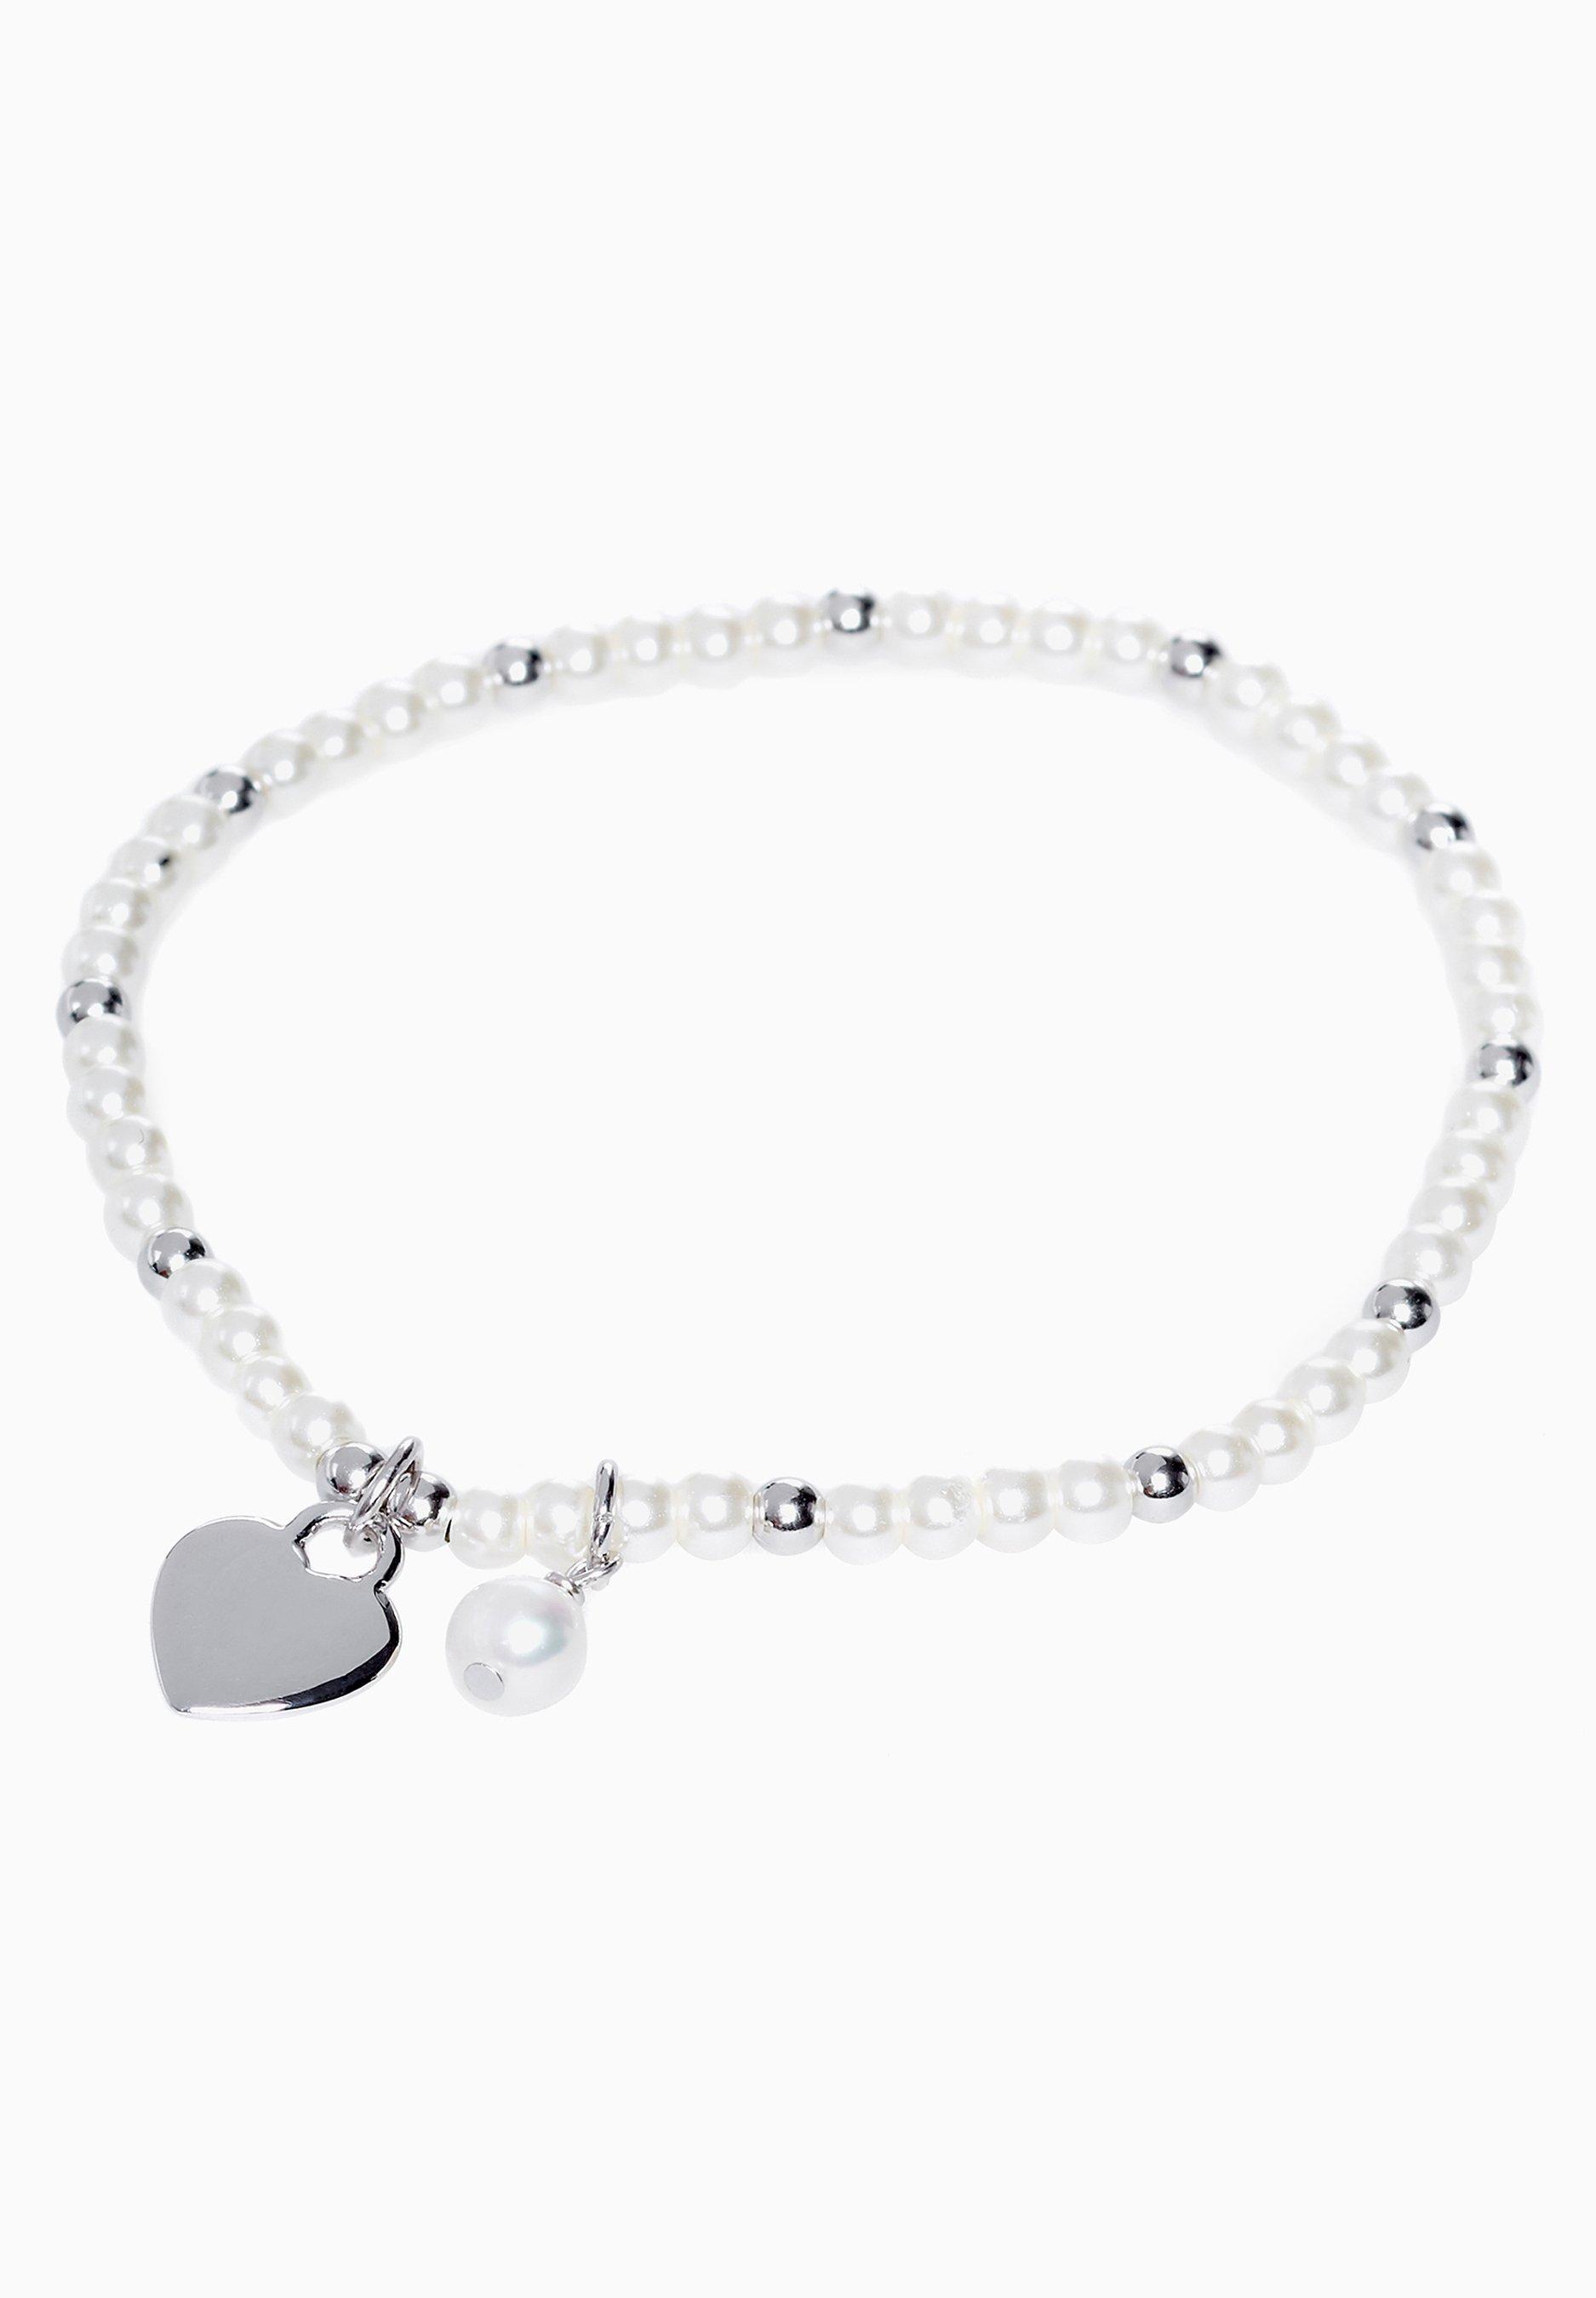 Femme WHITE STERLING SILVER PEARL EFFECT BRACELET - Bracelet